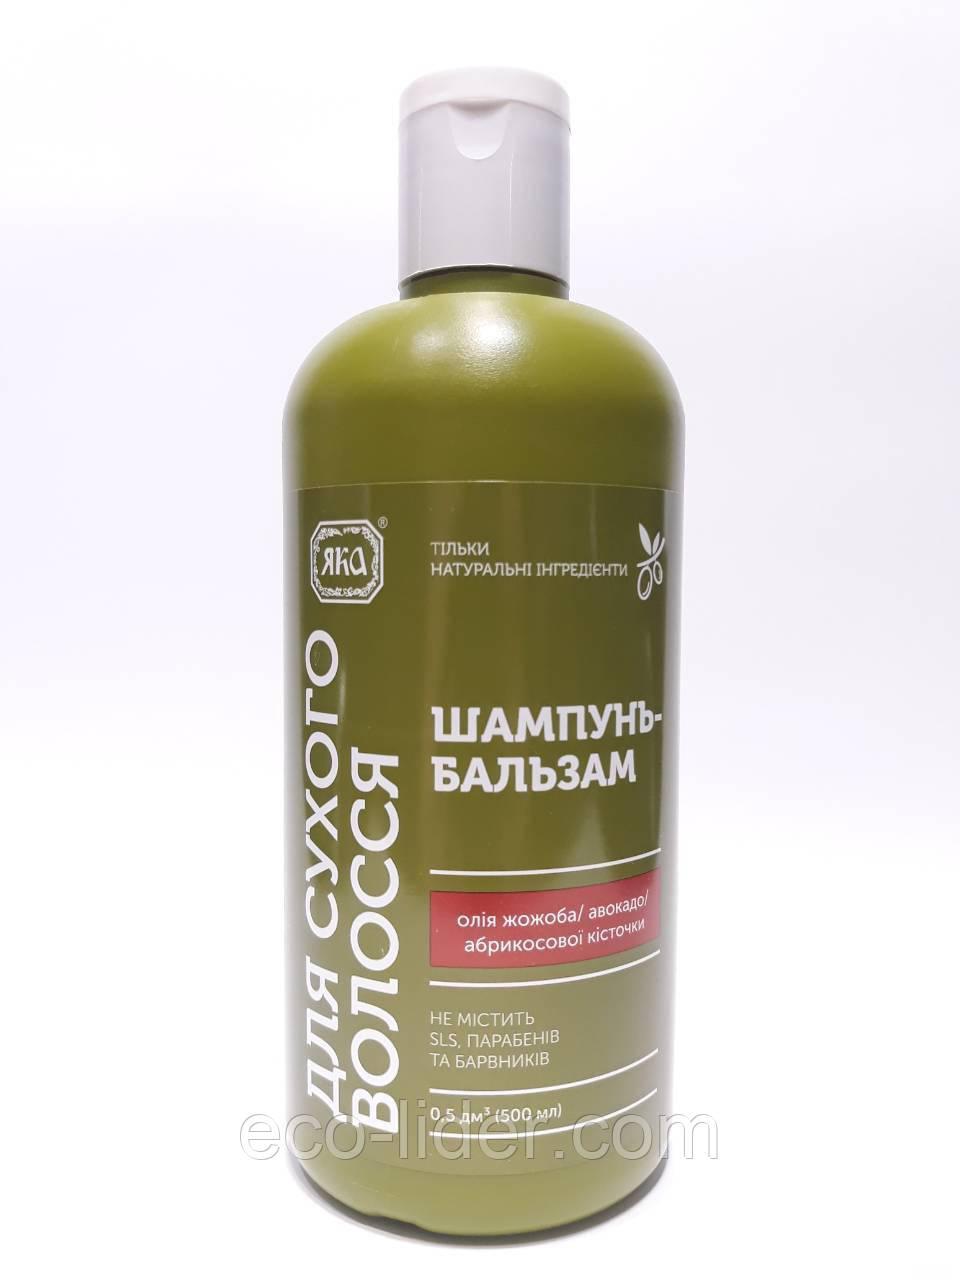 "Шампунь-бальзам для сухих волос, ТМ ""ЯКА"", 500 мл."